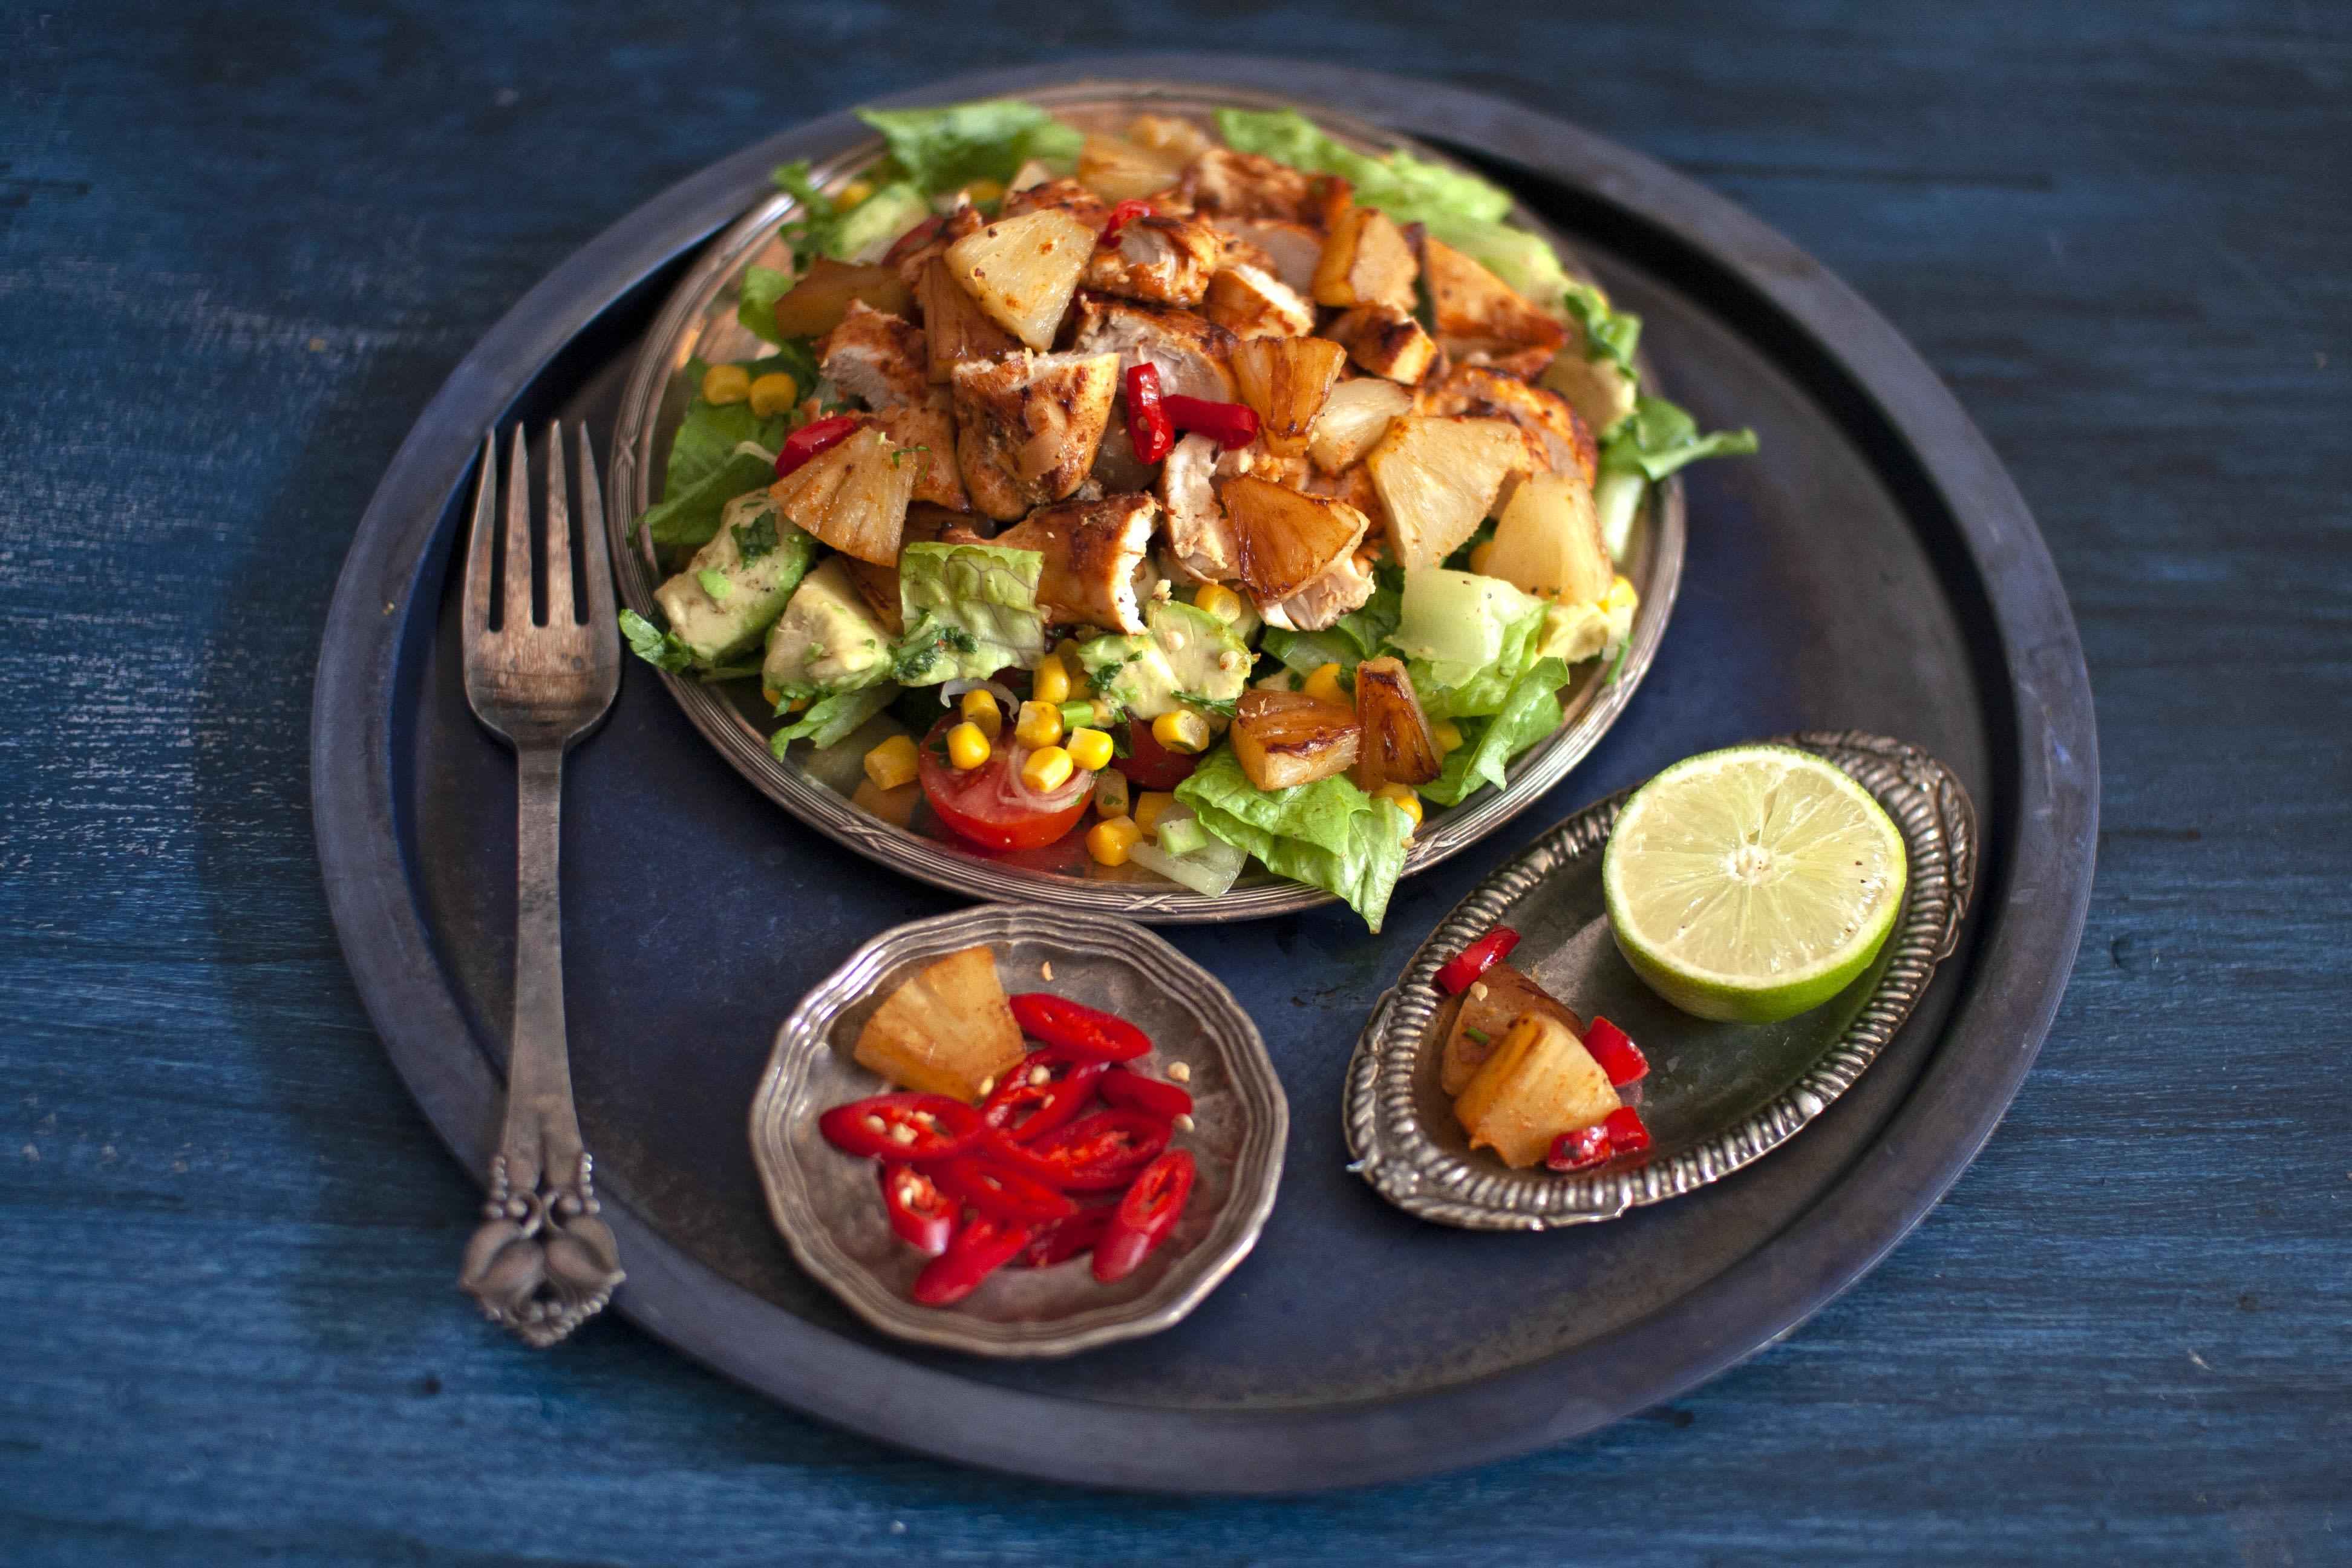 Chilli, Pineapple and Avocado Chicken Salad